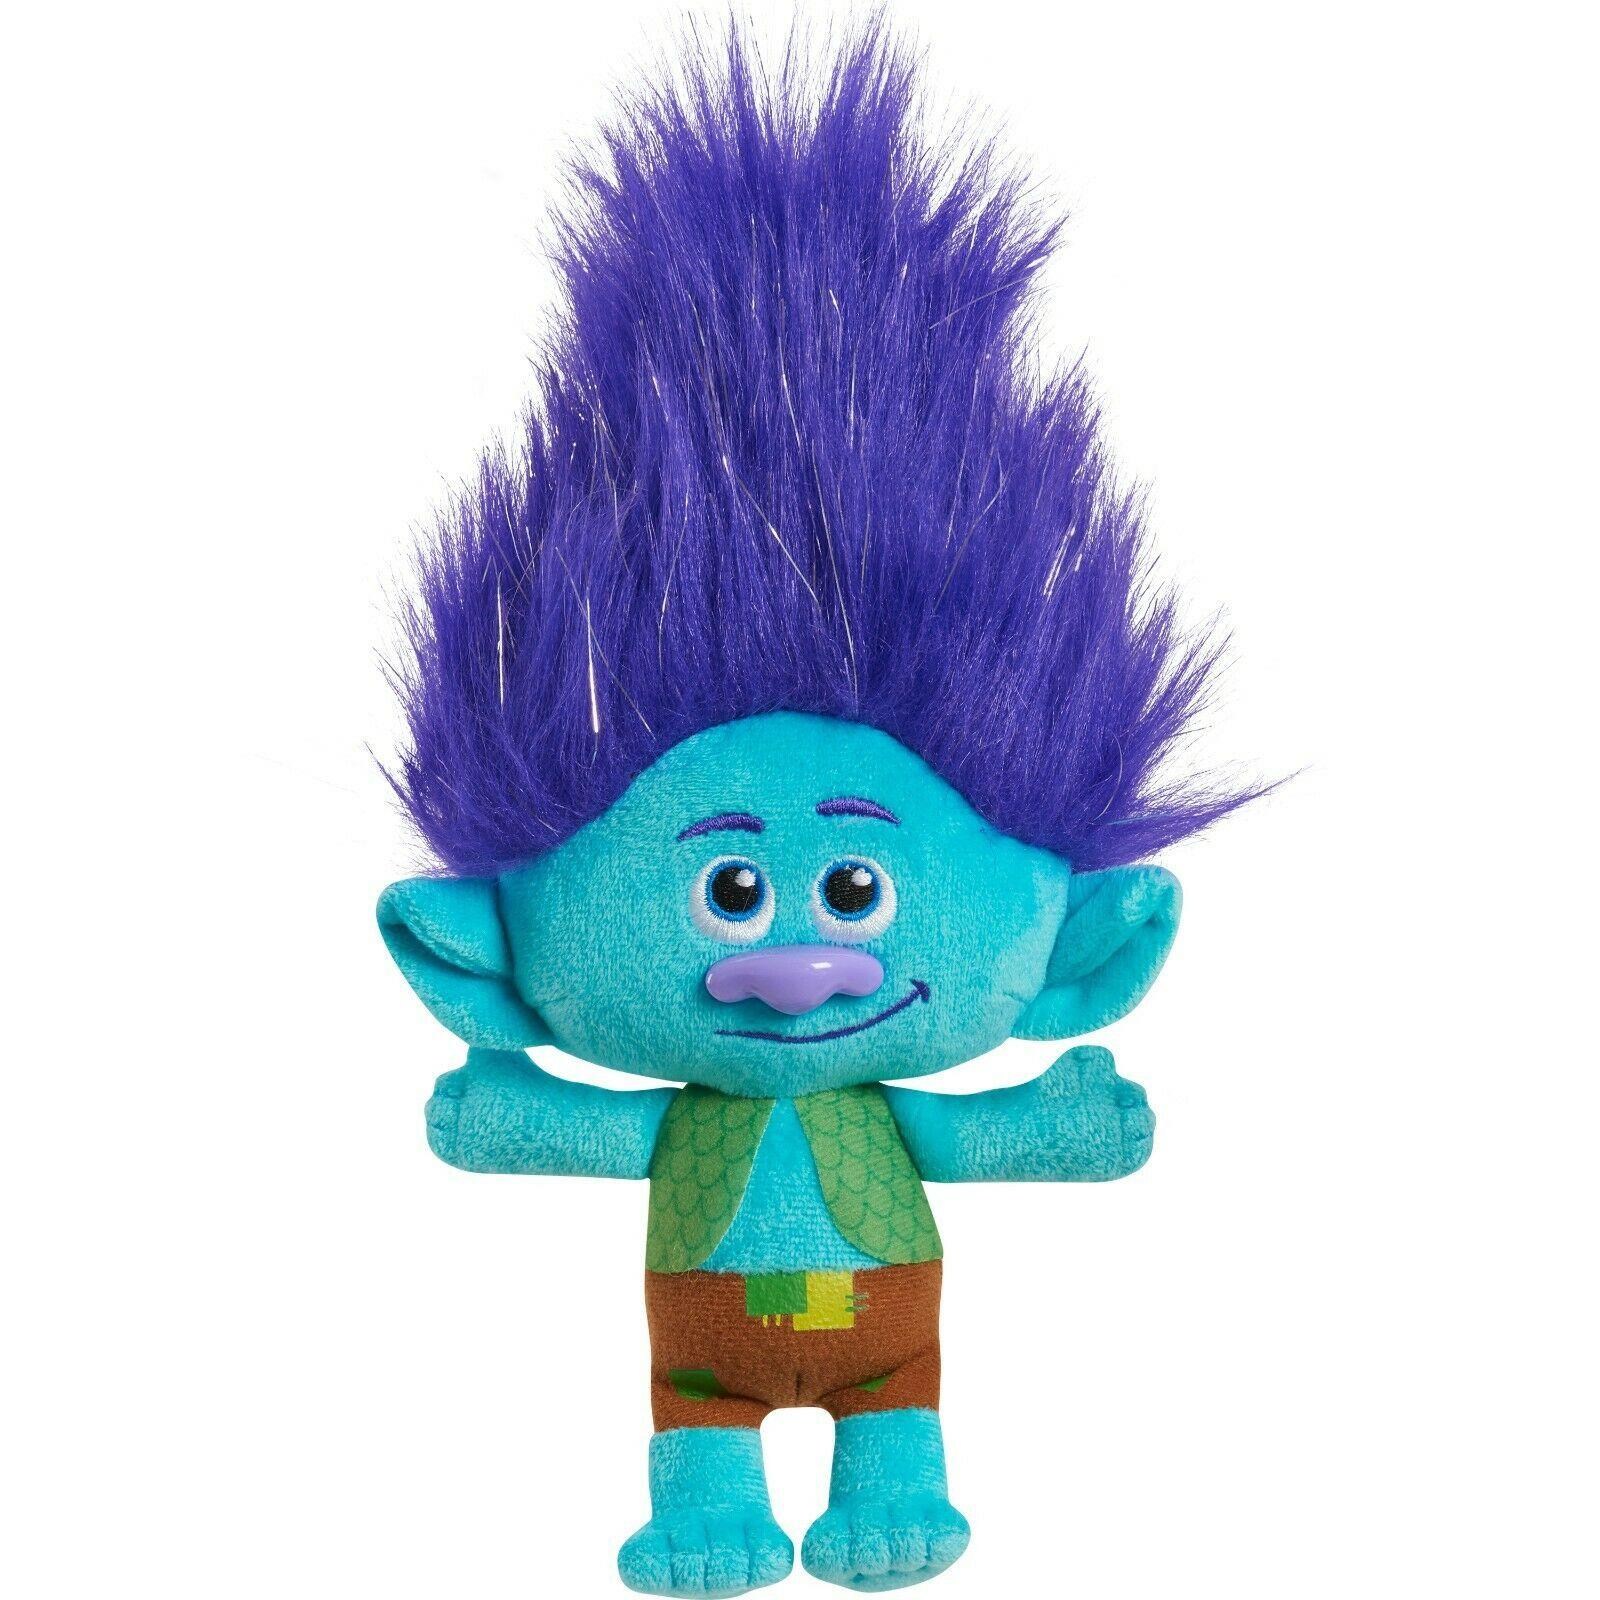 DreamWorks Trolls World Tour 8 Inch Small Plush Branch - New - $16.99